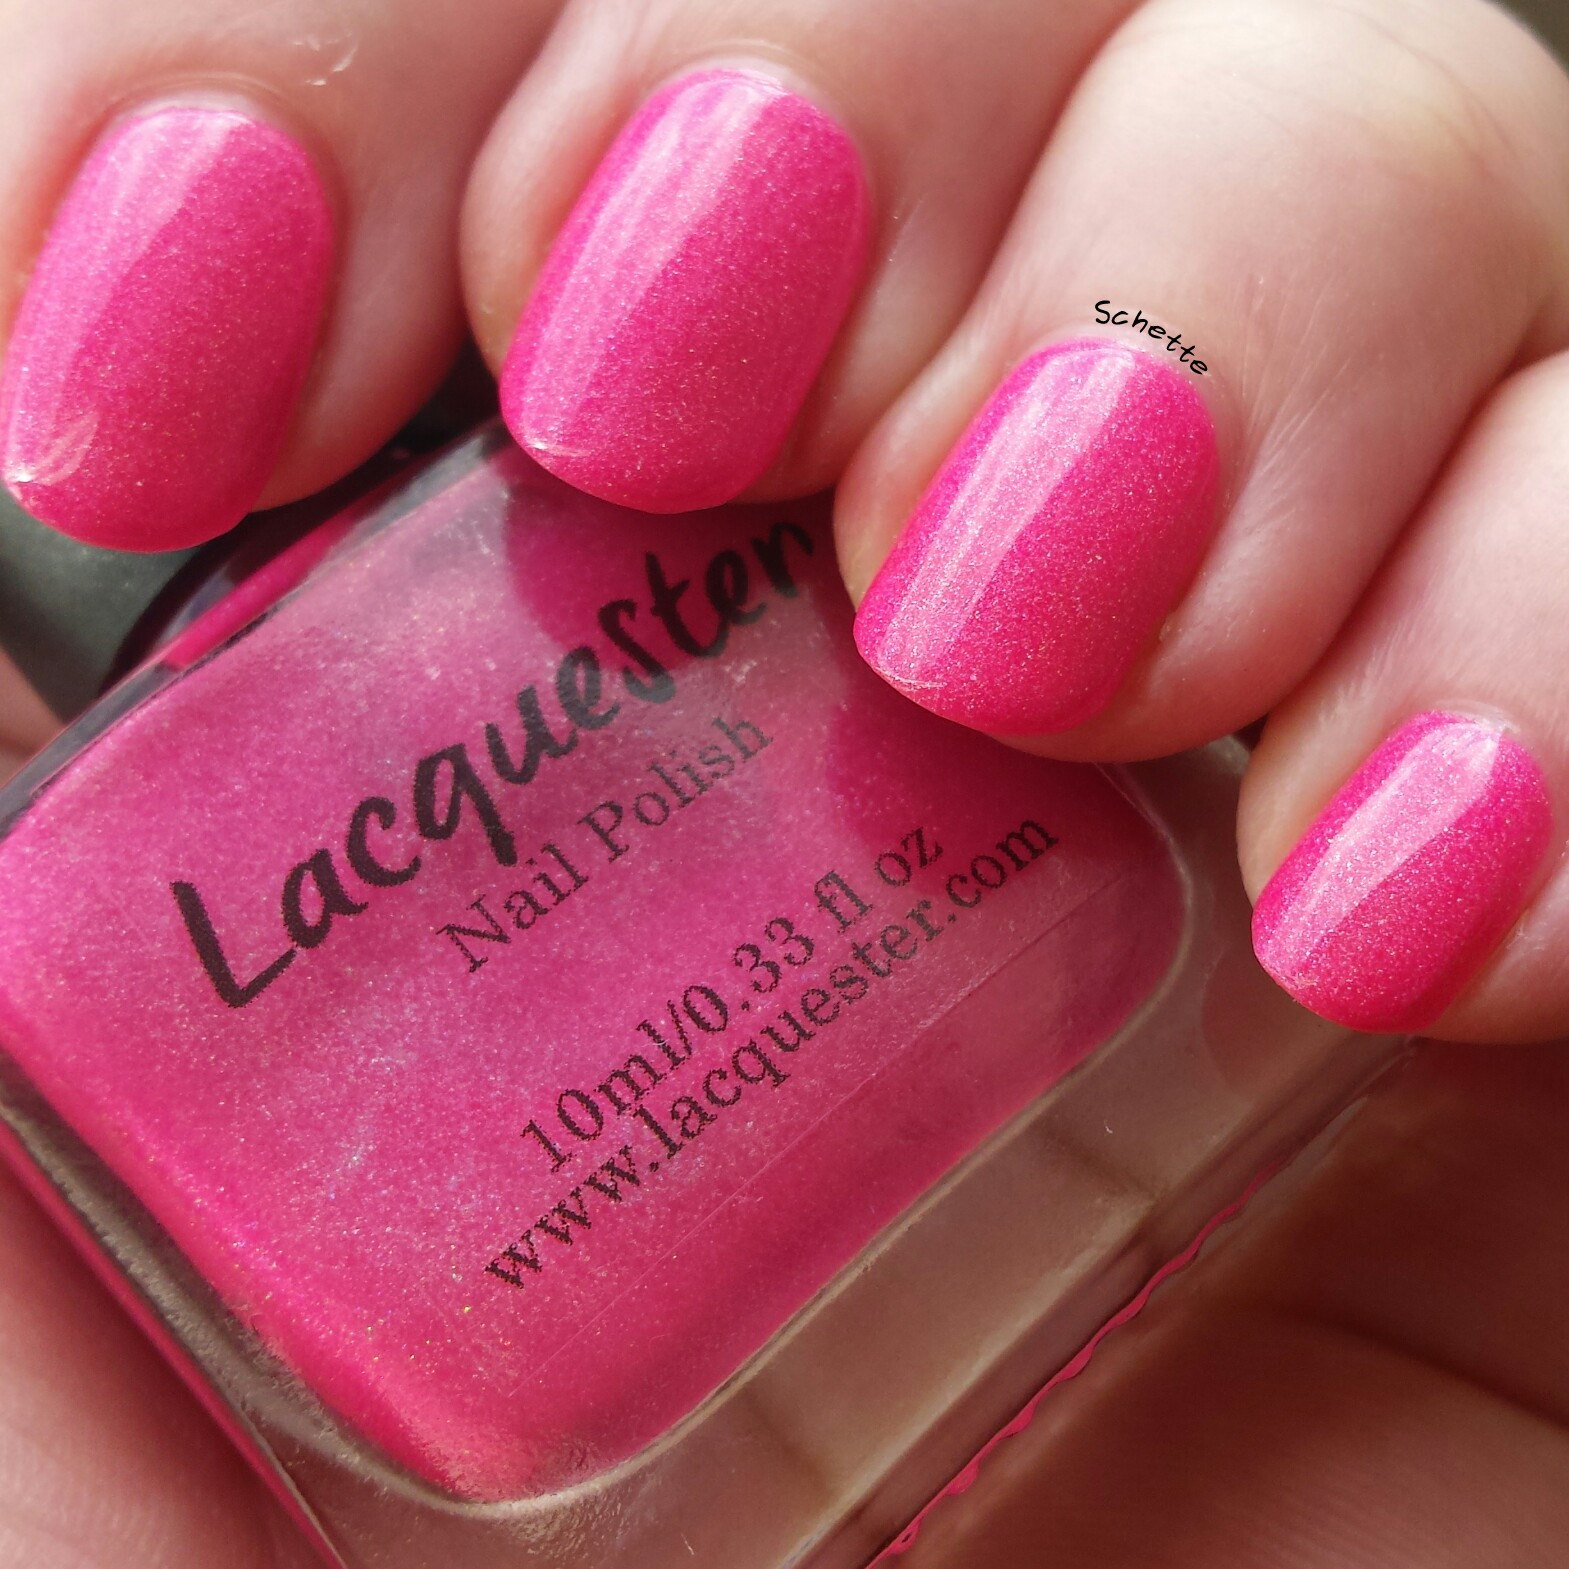 Lacquester : Barbie's Revenge, Prototype #2